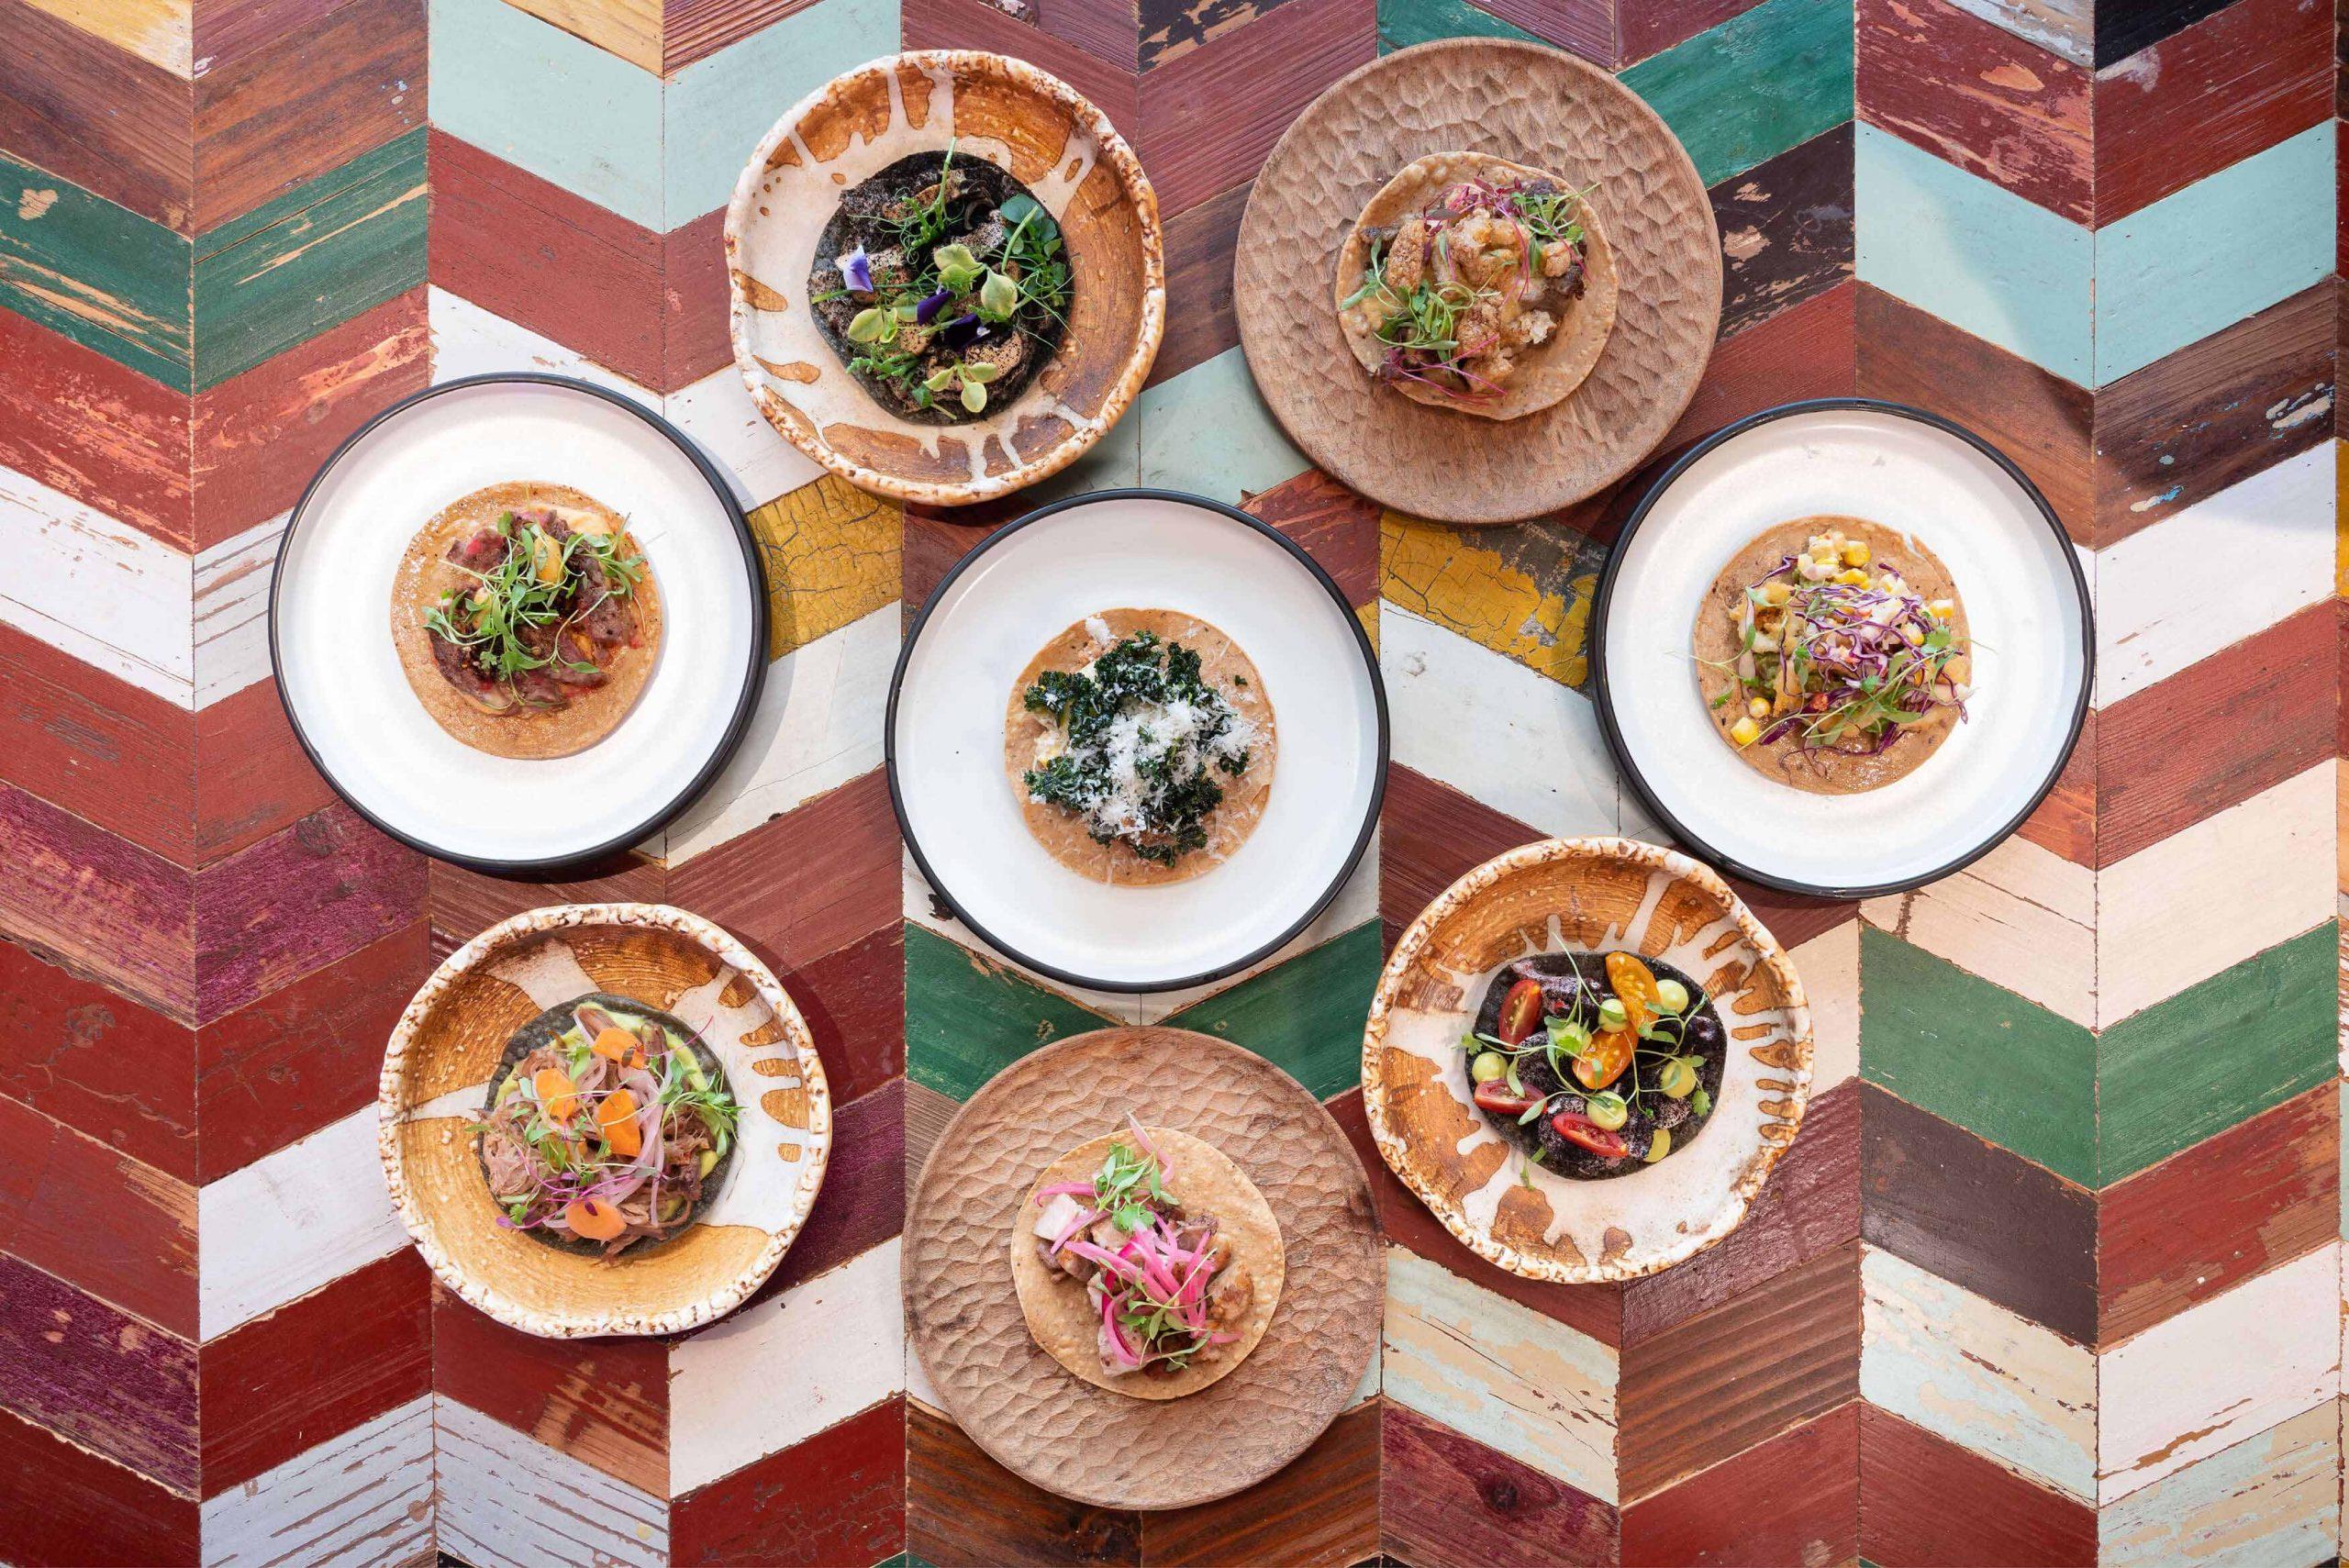 Ovolo Te Quiero Mucho Hospitality Identity - Taco food photography